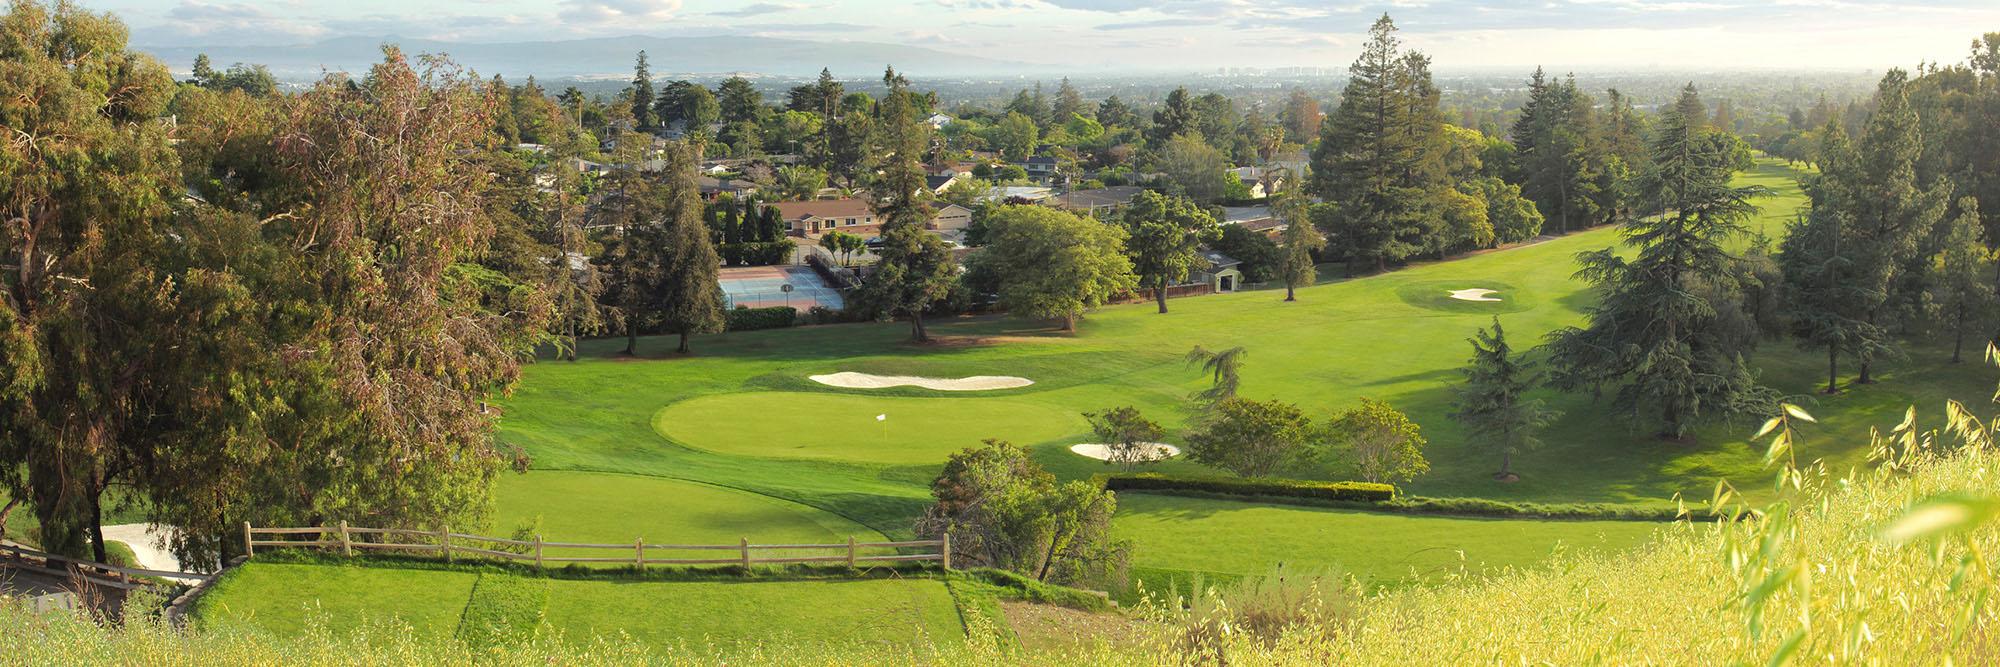 Golf Course Image - San Jose Country Club No. 16